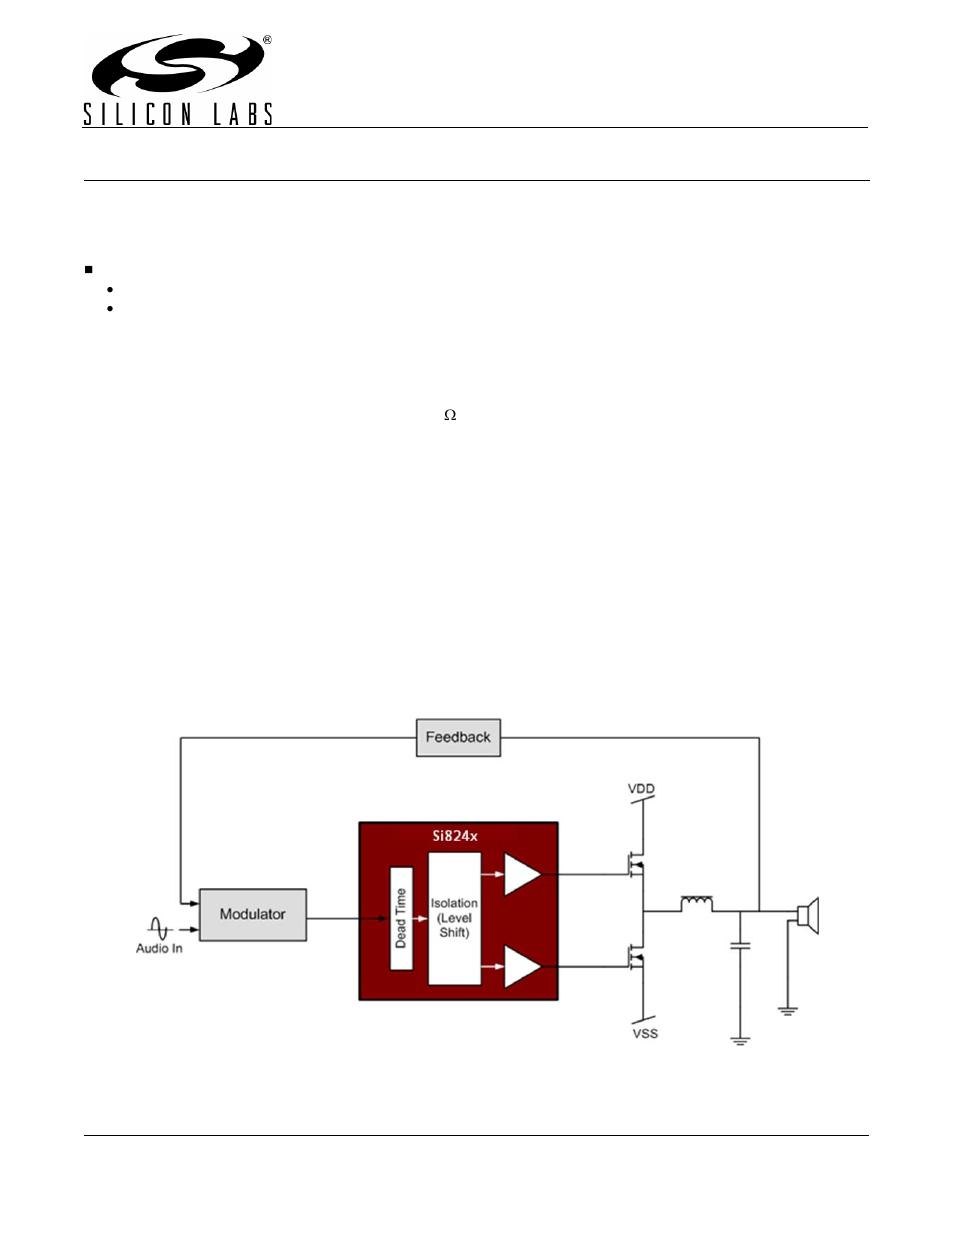 silicon laboratories si824xclassd kit si8410 user manual 16 pages rh manualsdir com Guitar Tube Amp Kit Amp Install Kit